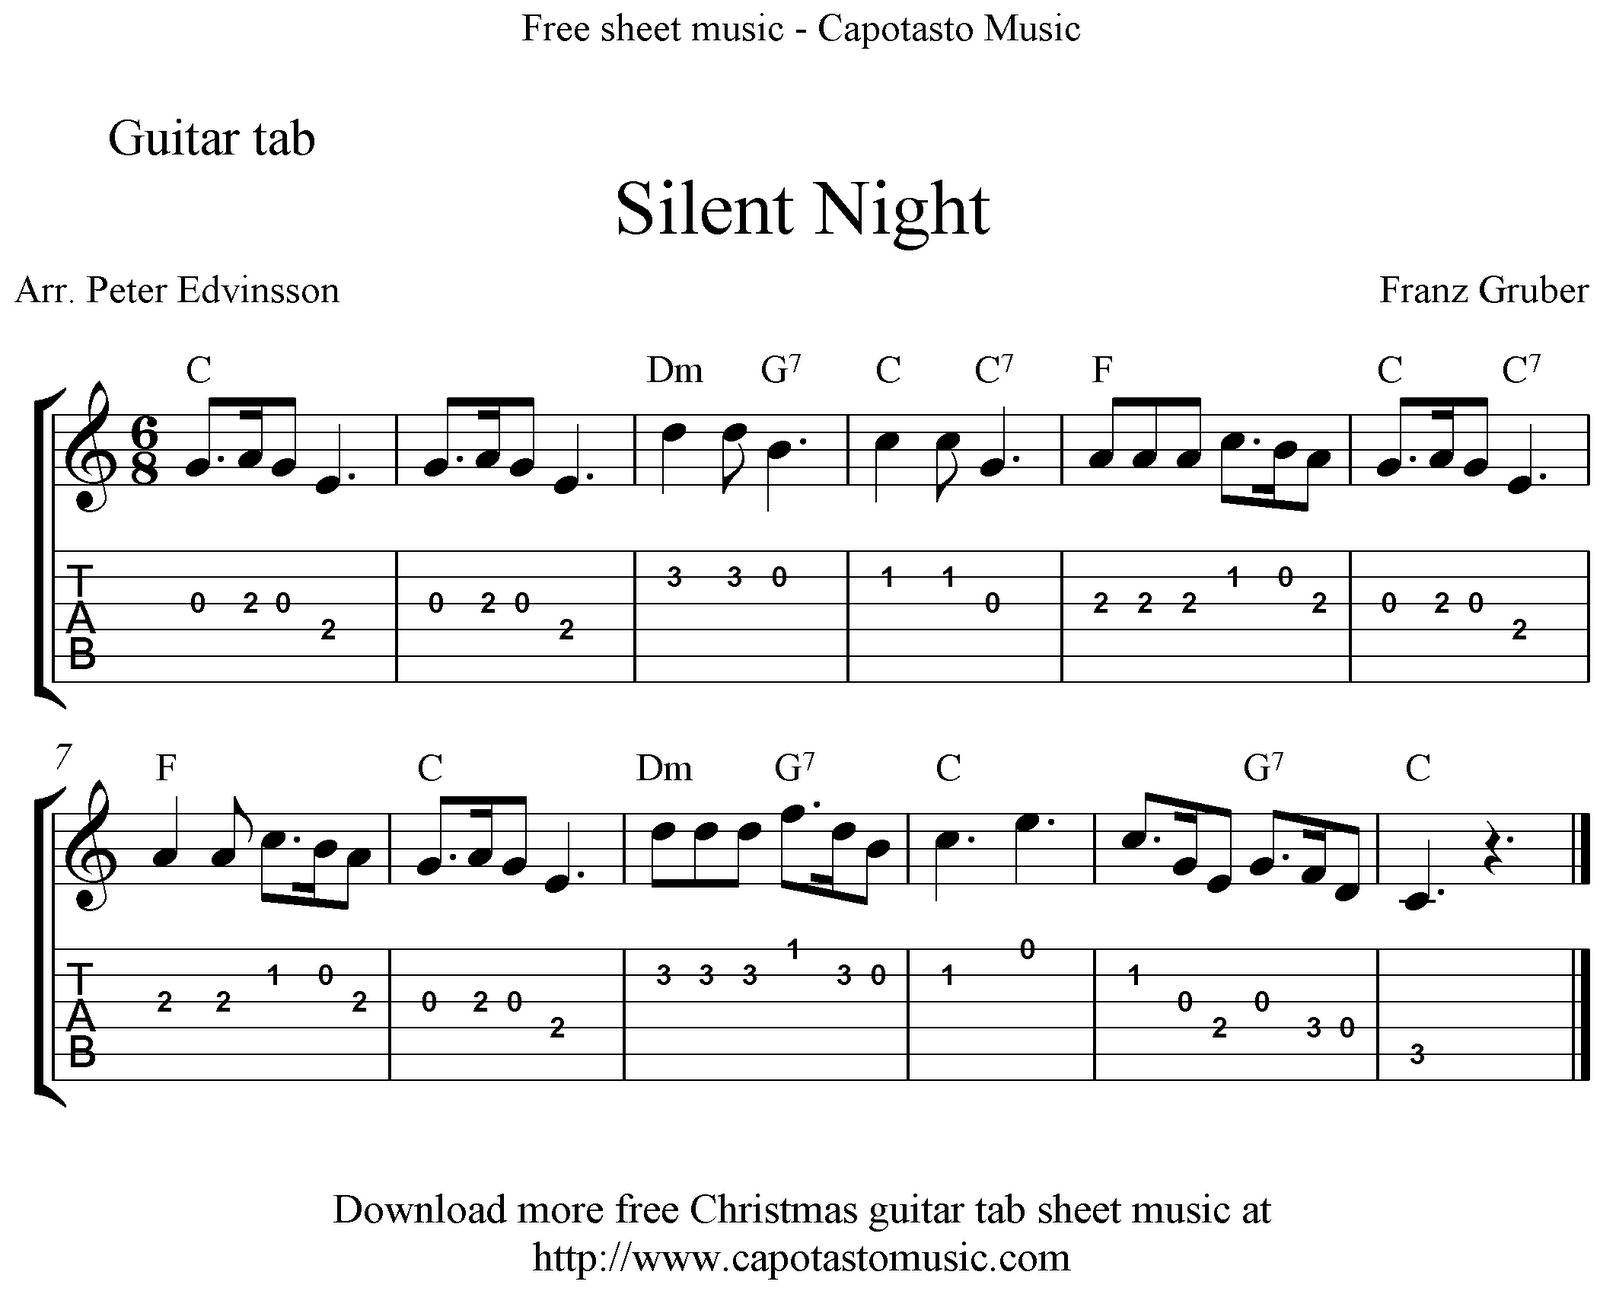 Silent Night, Easy Free Christmas Guitar Tab Sheet Music - Free Printable Guitar Music